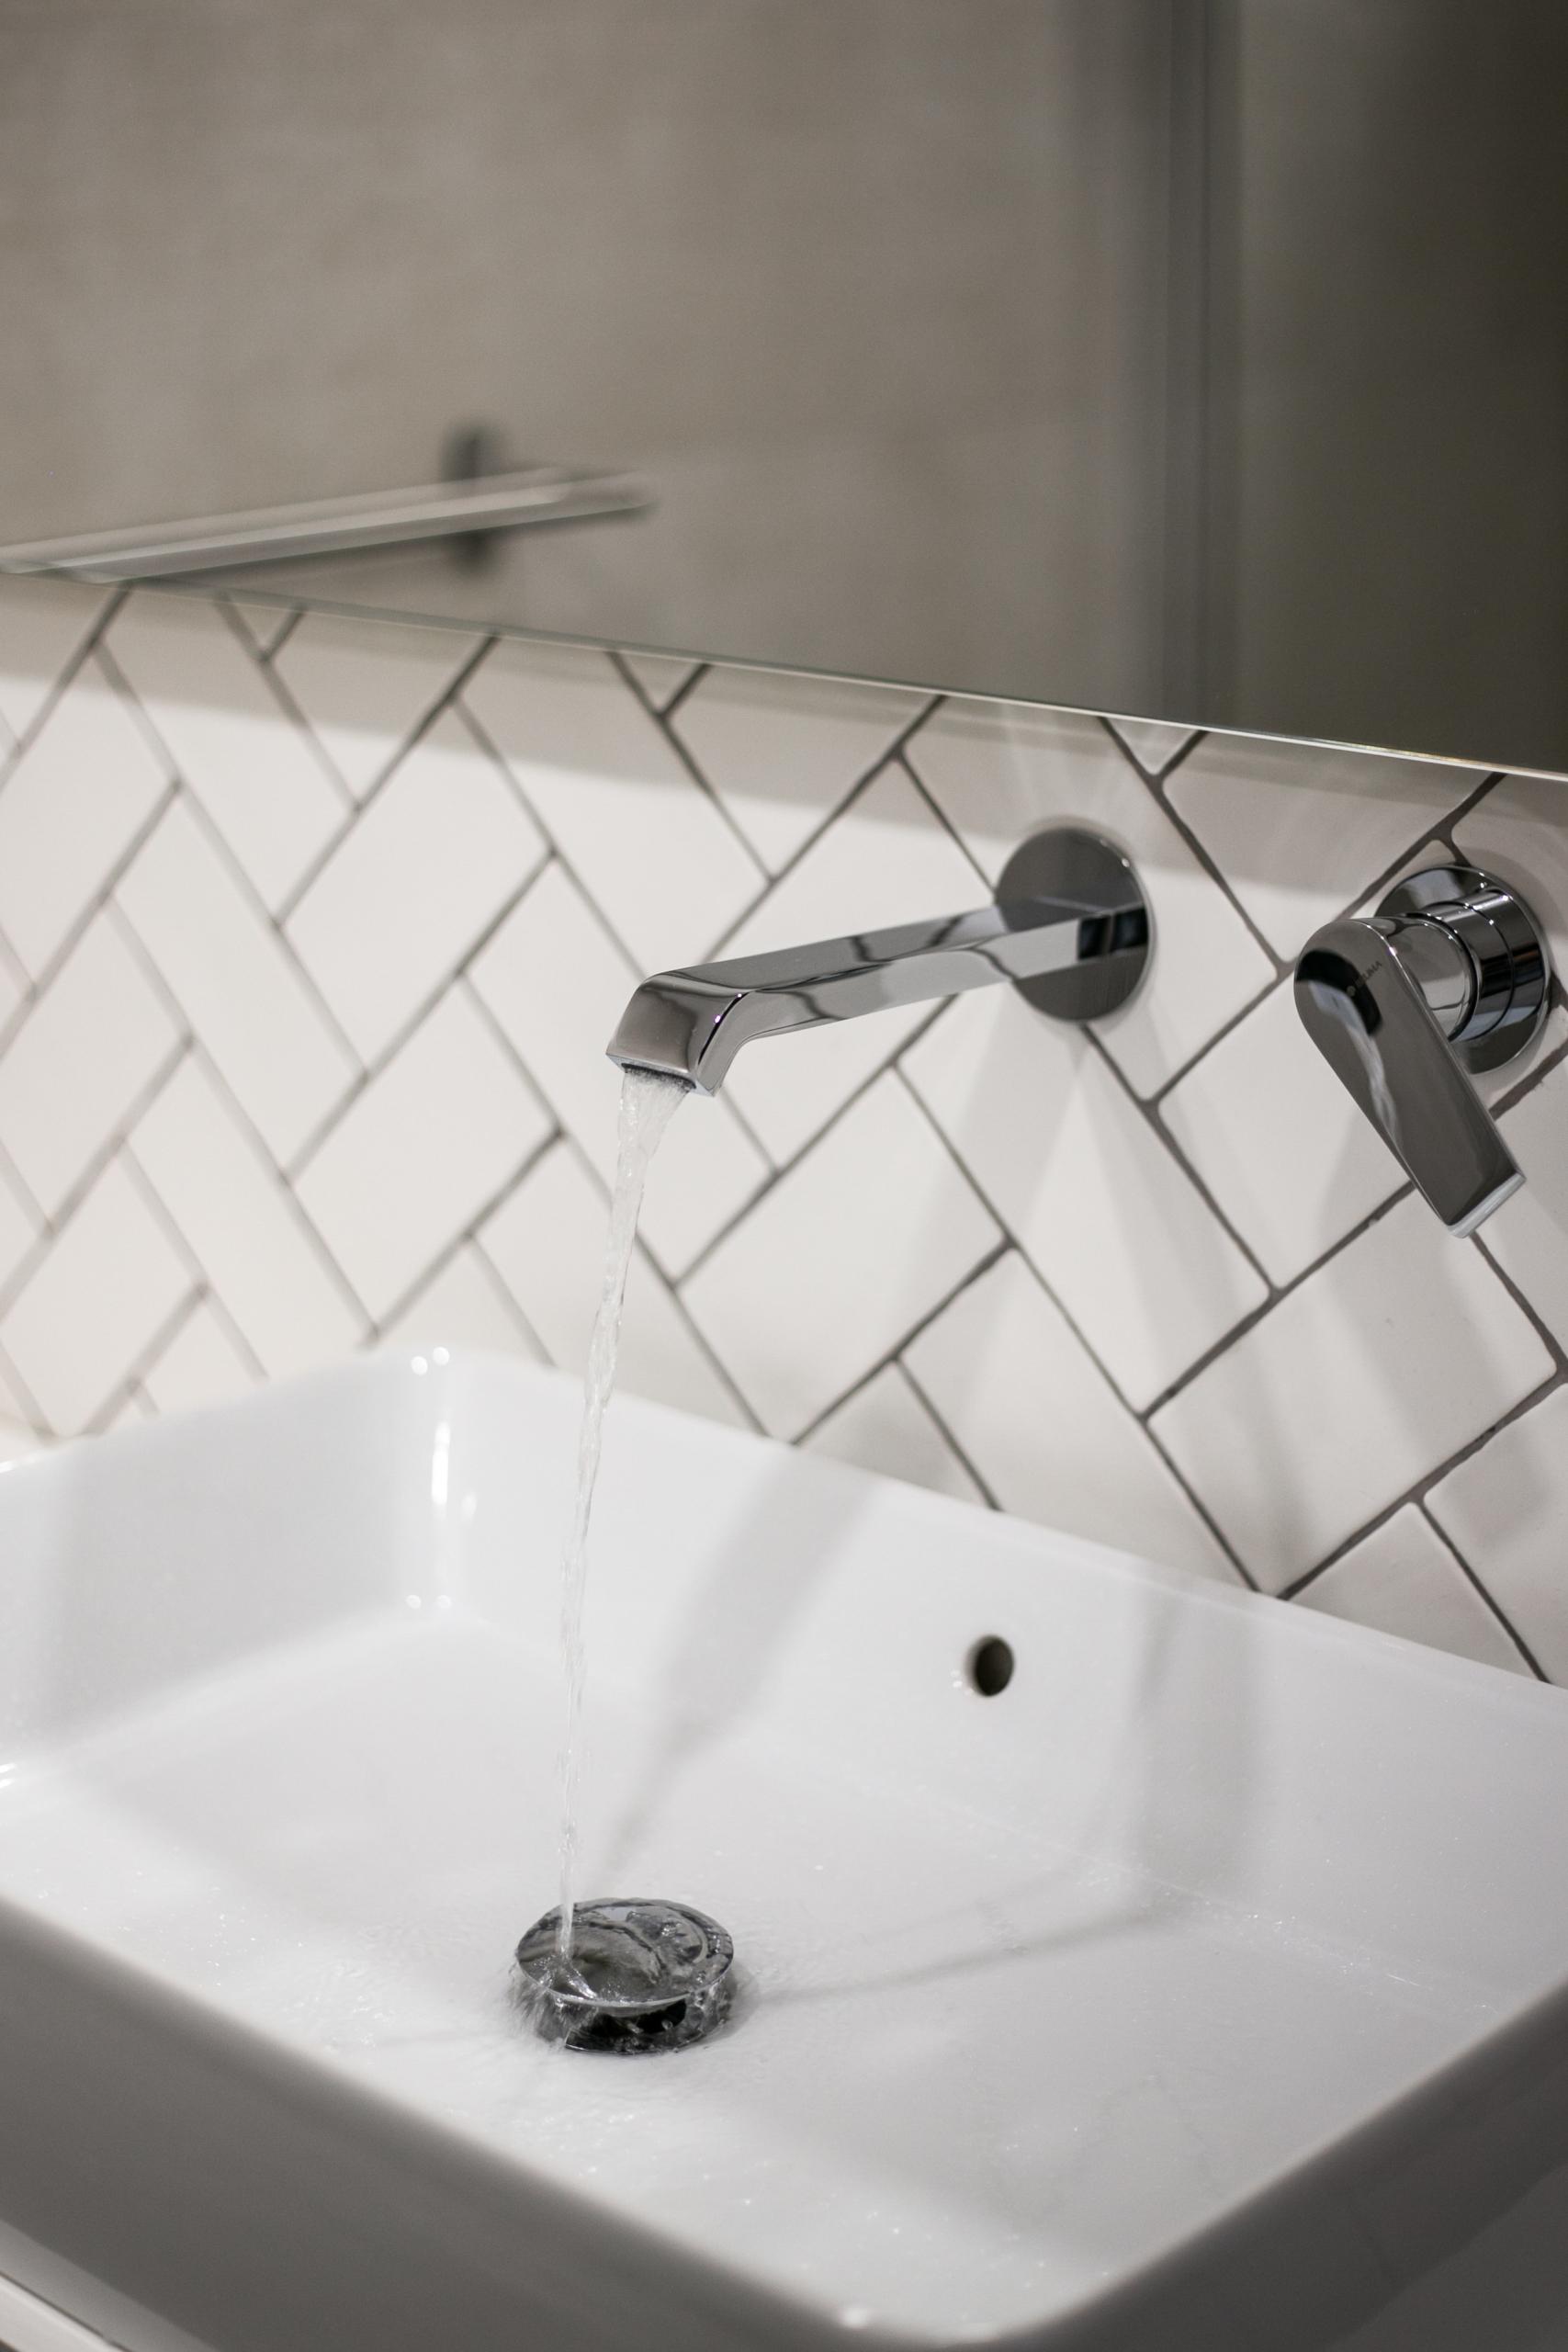 Arq – wc torneira